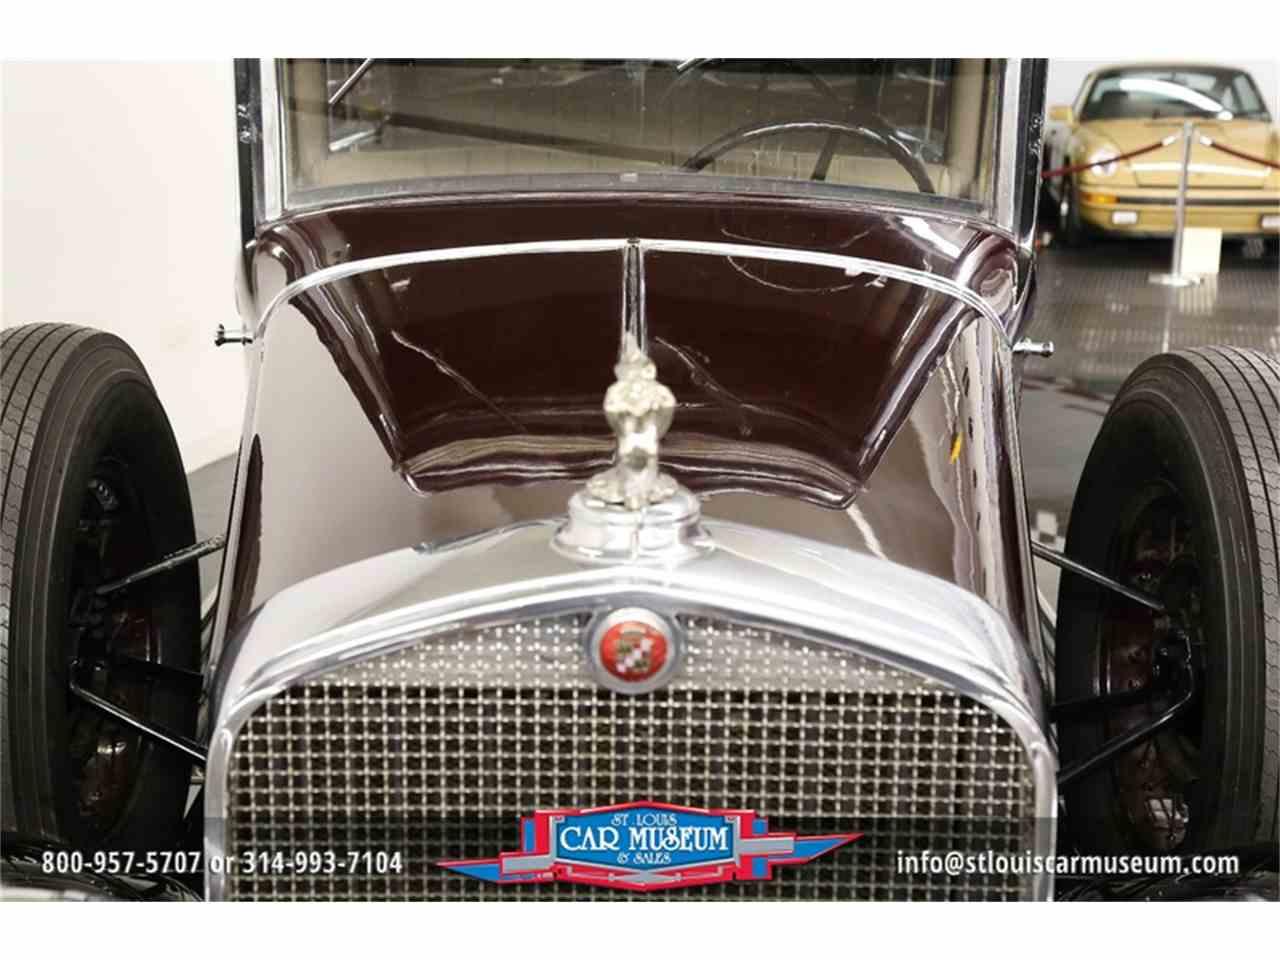 Large Picture of 1931 Cadillac V-16 Madam X Landau Sedan - $374,900.00 - JSU3